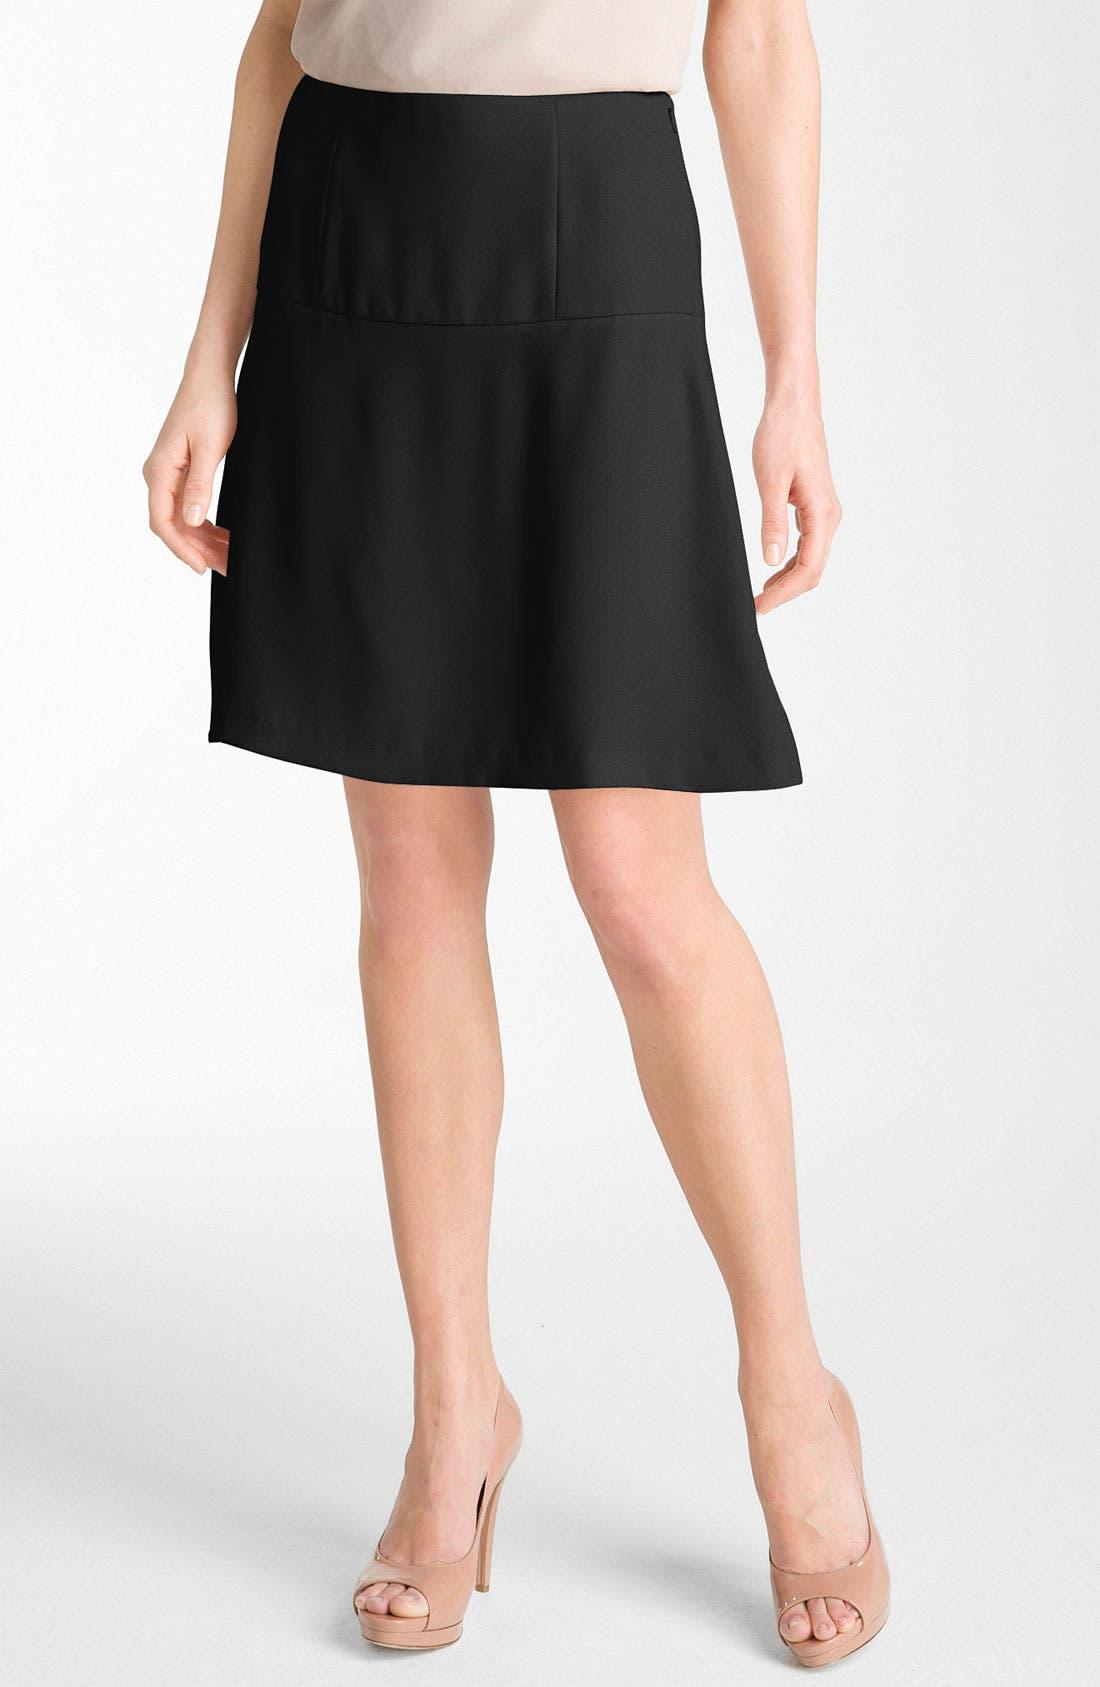 Alternate Image 1 Selected - Theory 'Salda - Vamp' A-Line Skirt